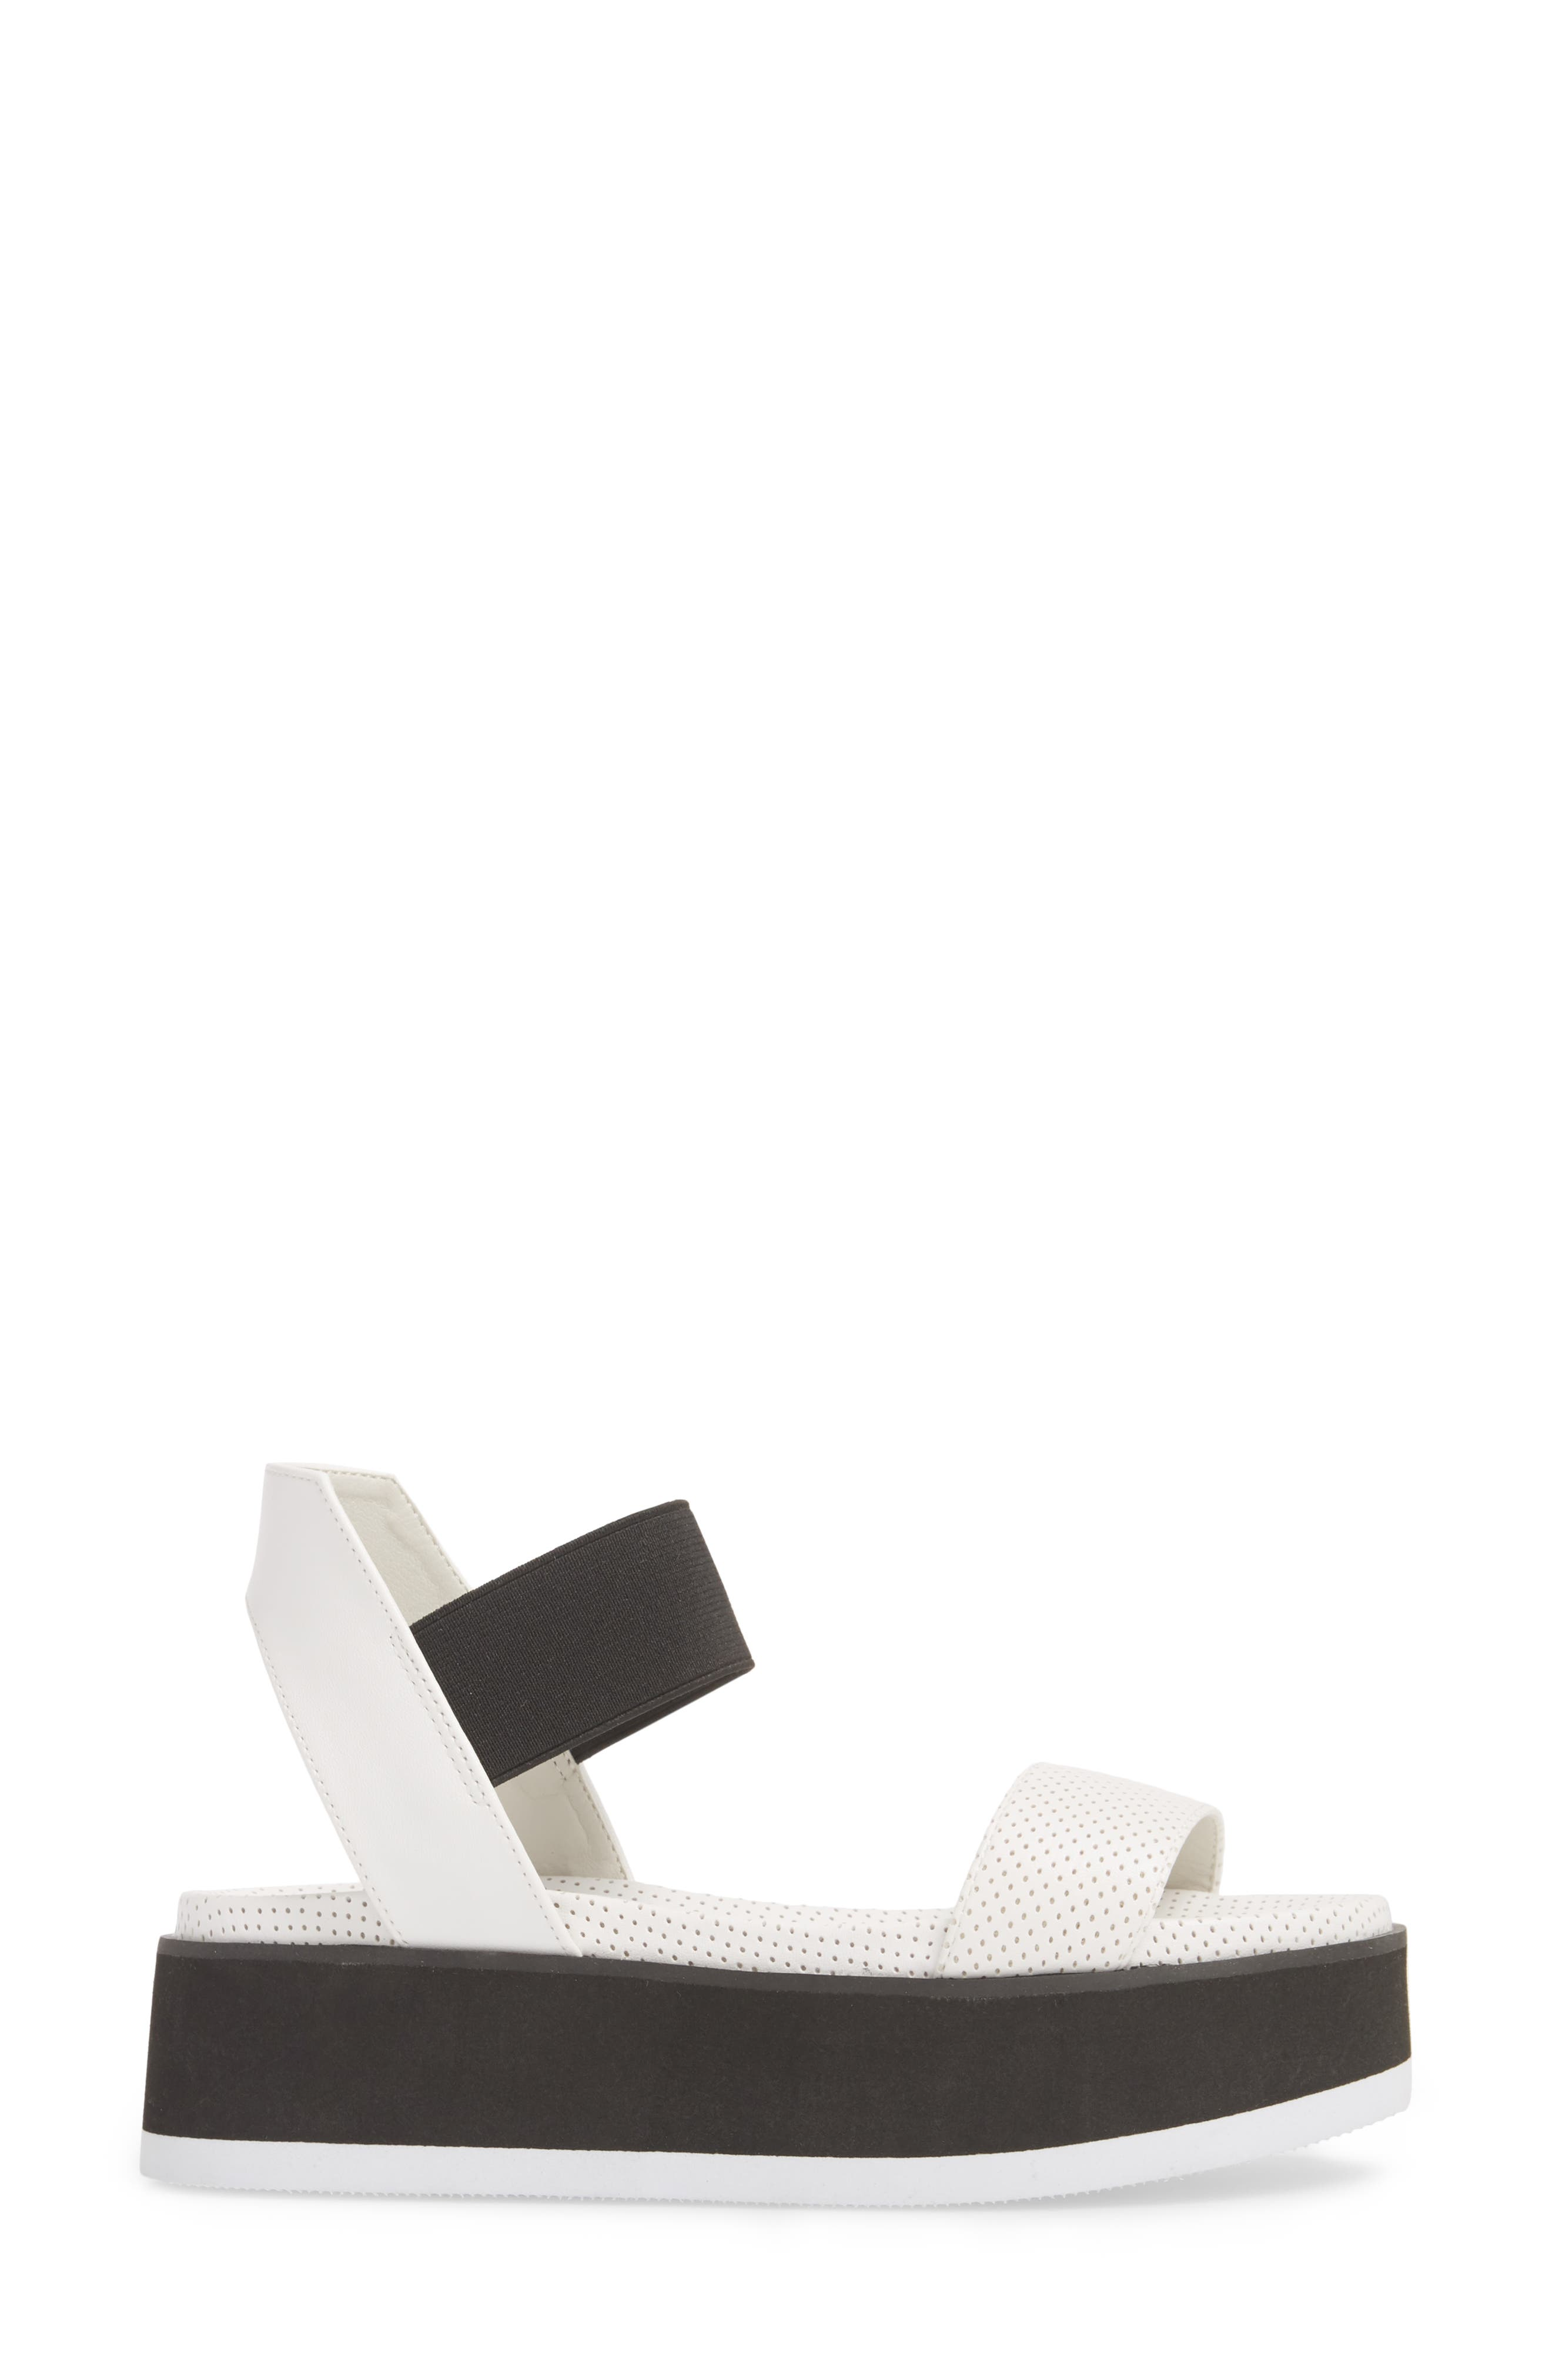 Josie Perforated Platform Sandal,                             Alternate thumbnail 6, color,                             White